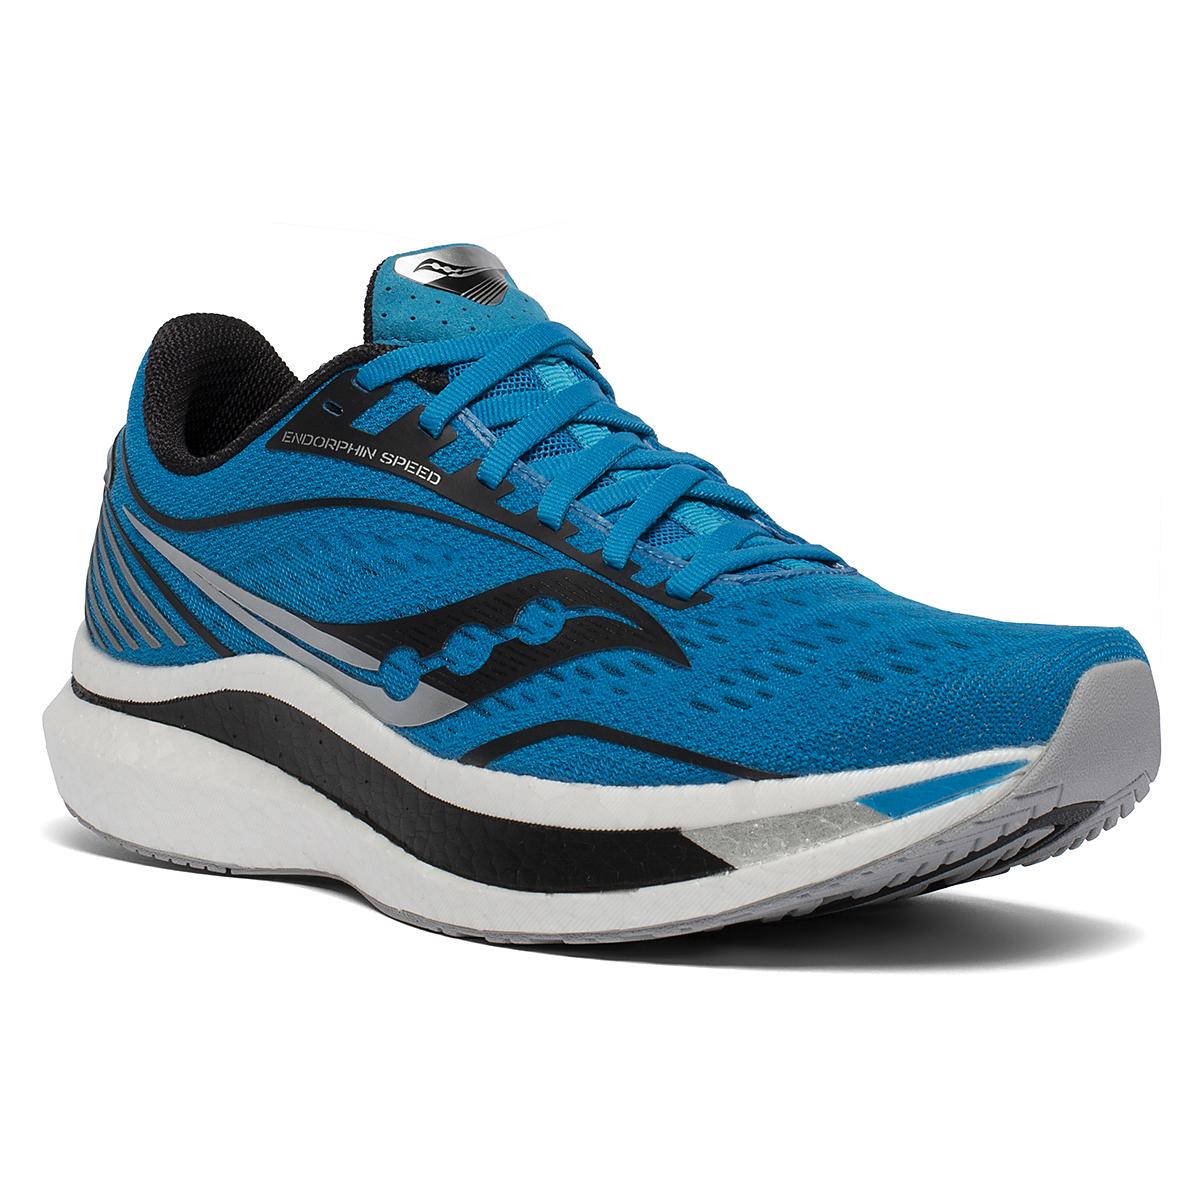 Men's Saucony Endorphin Speed Running Shoe - Color: Cobalt/Silver - Size: 8 - Width: Regular, Cobalt/Silver, large, image 5